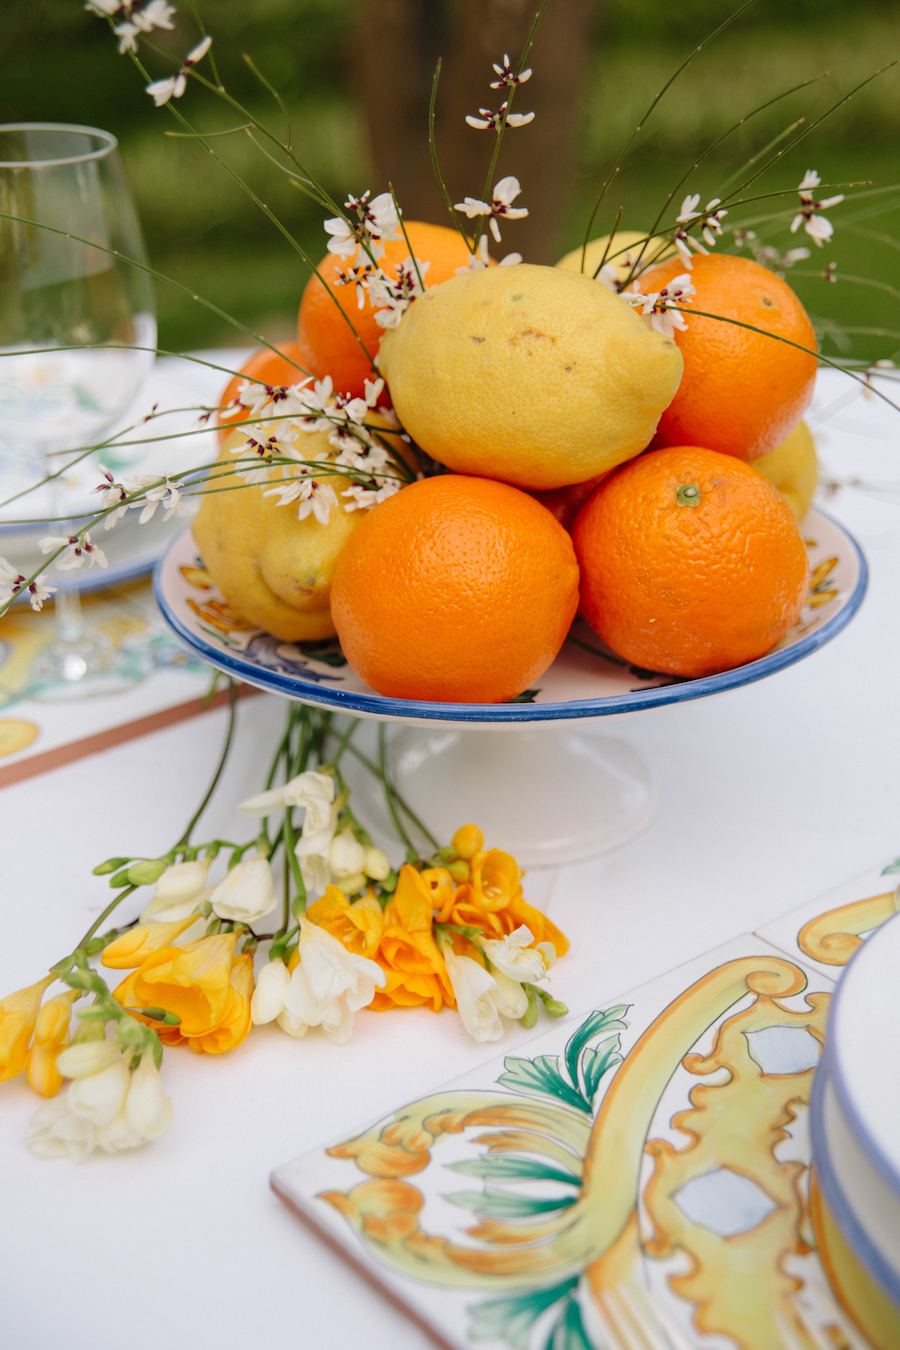 centrotavola con limoni e arance